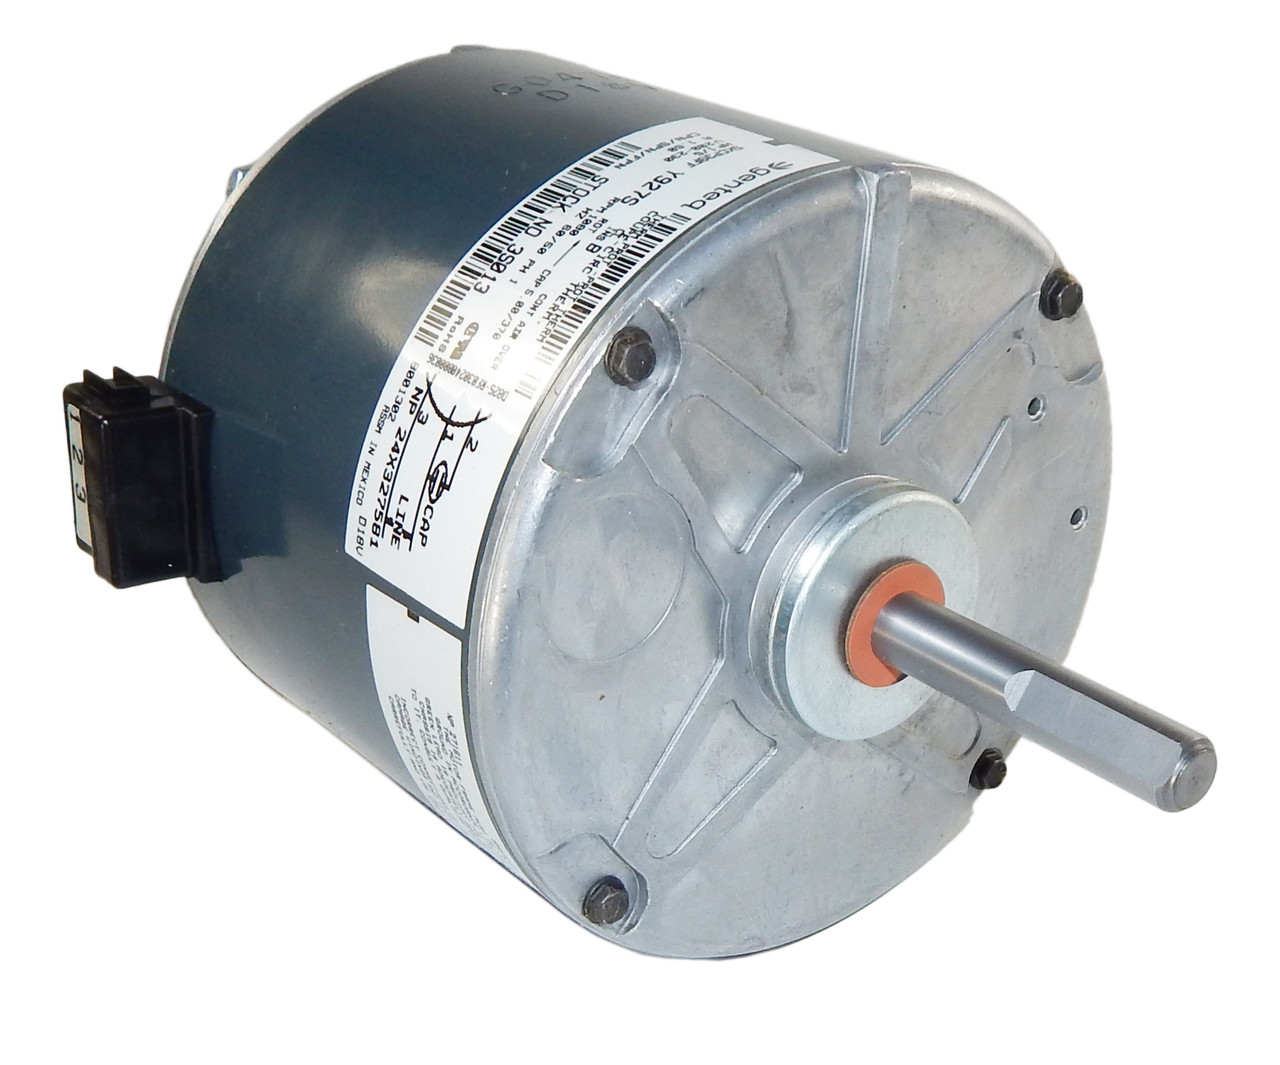 Ac Condenser Fan Wiring Diagram Ac Fan Motor Wiring Diagram On 3 Sd